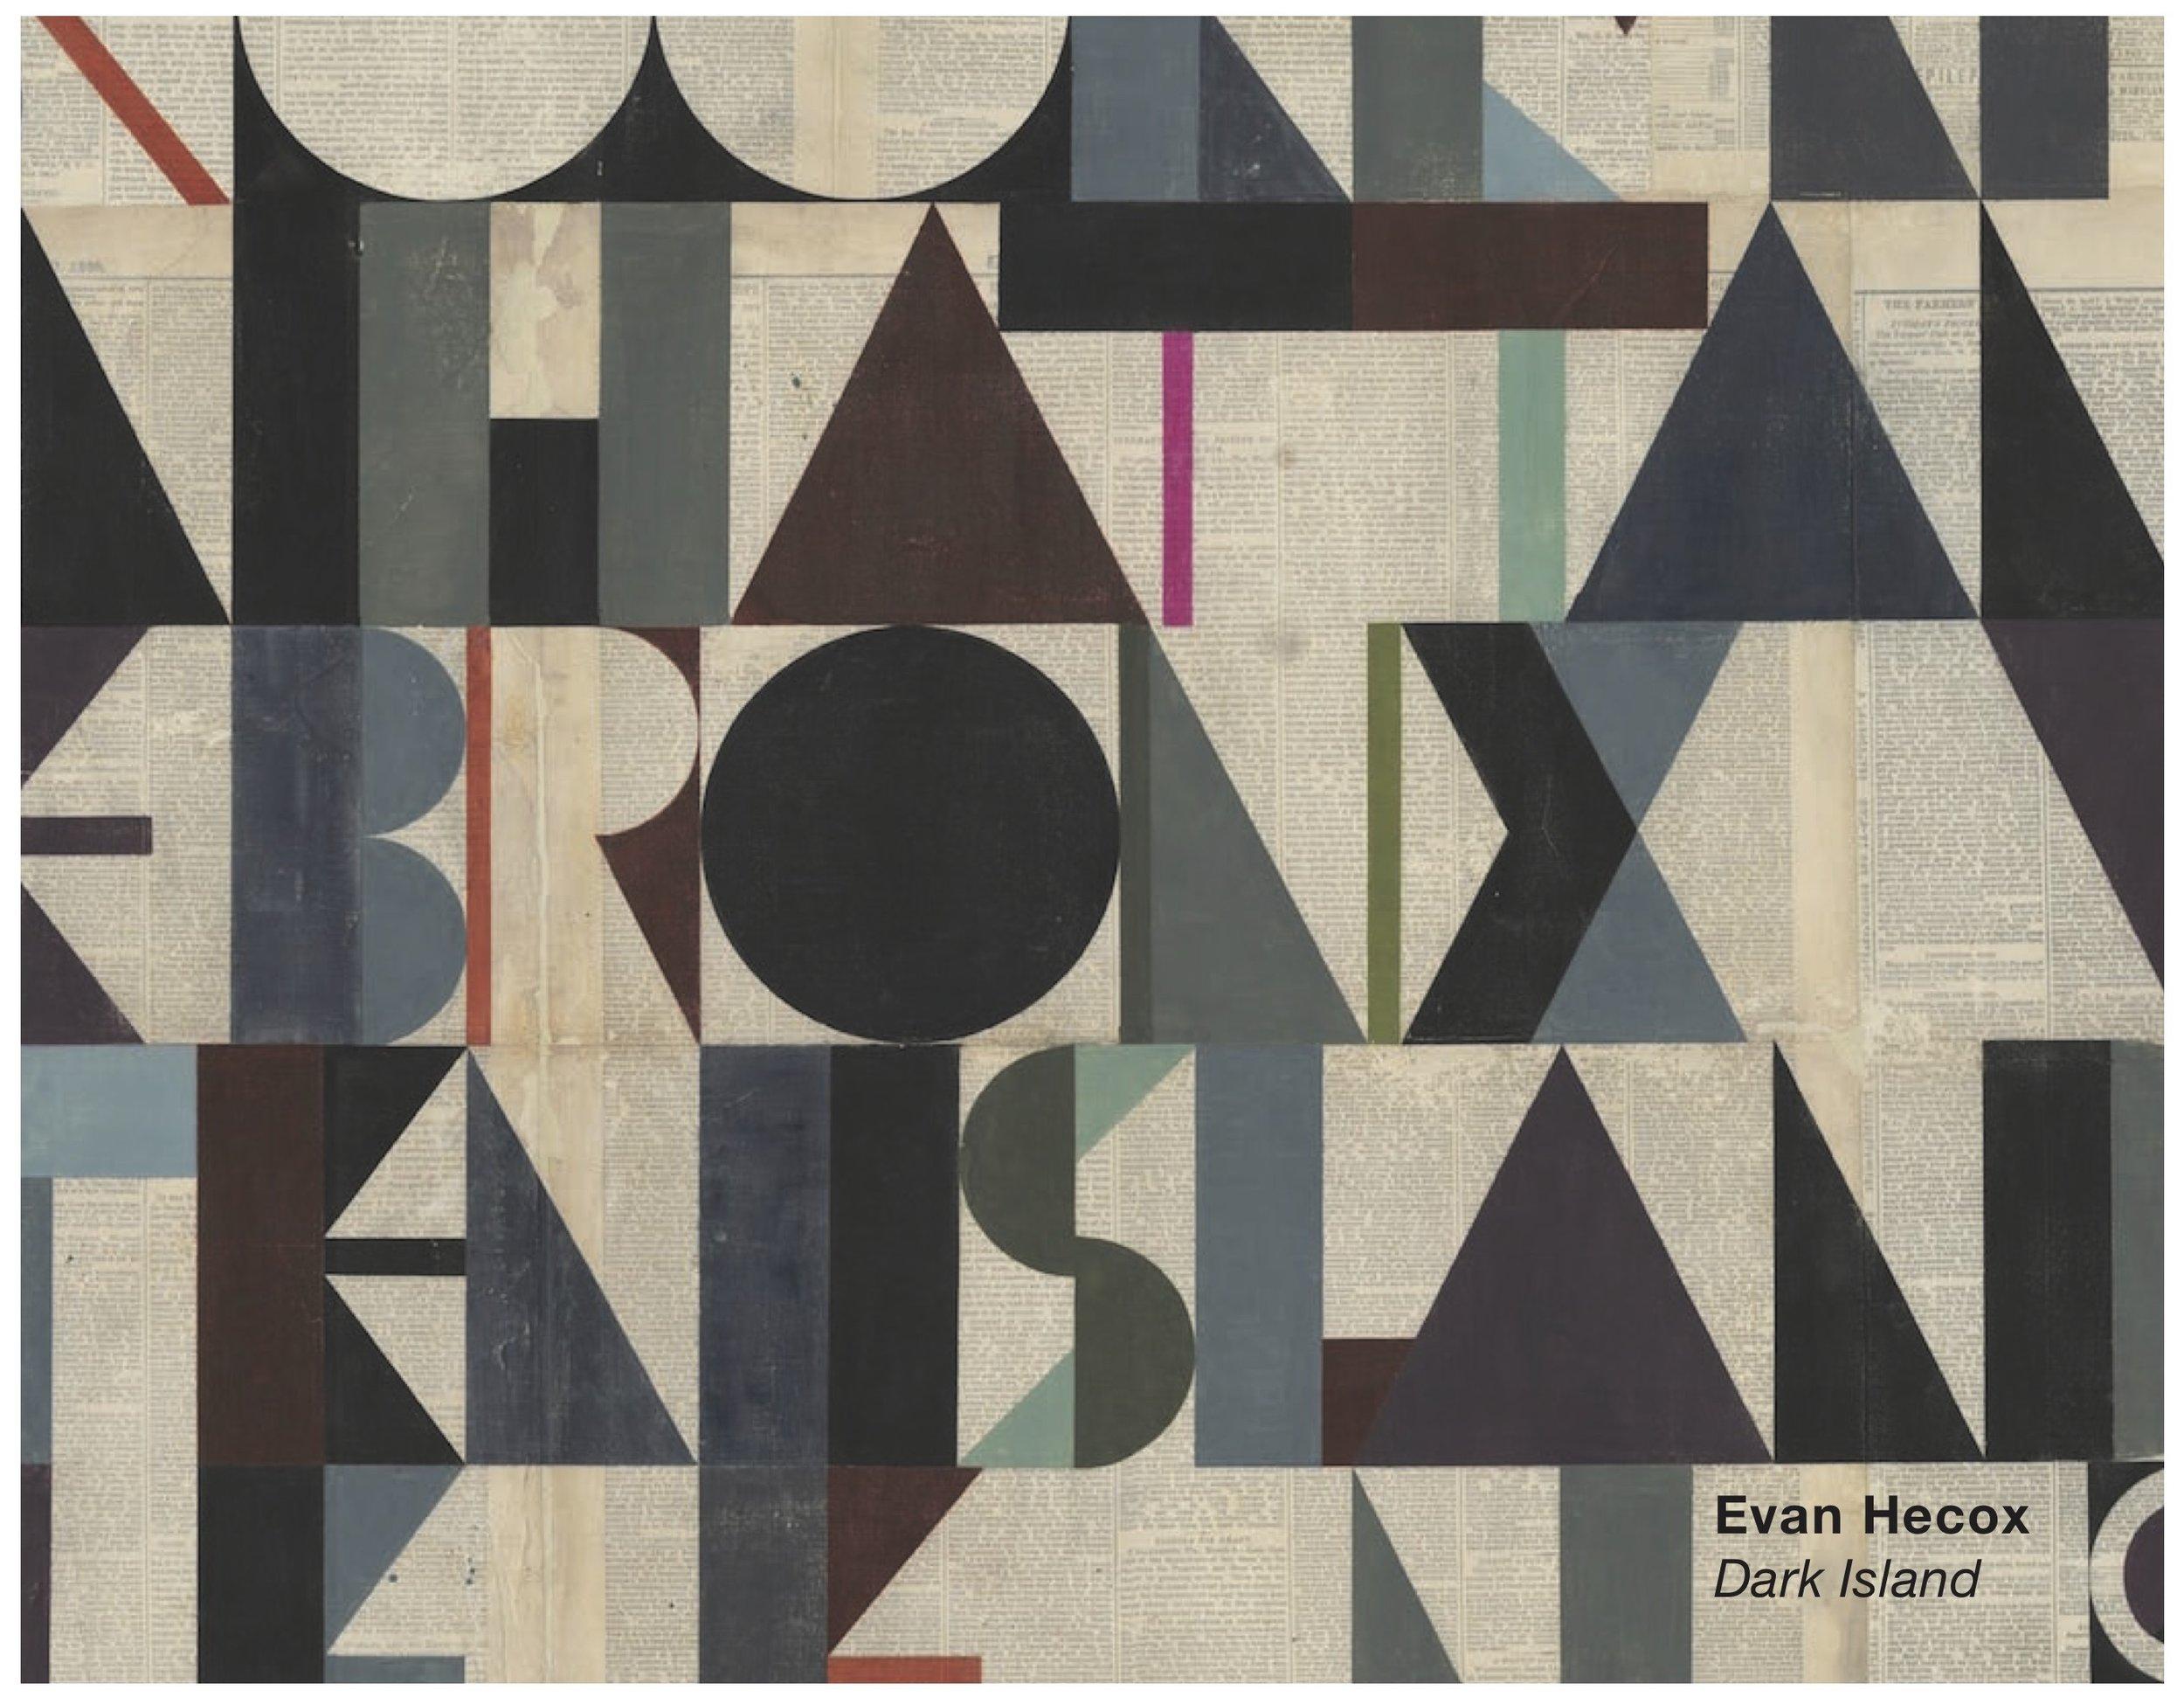 Evan Hecox_Dark Island_Joshua Liner Gallery_New York City_2012